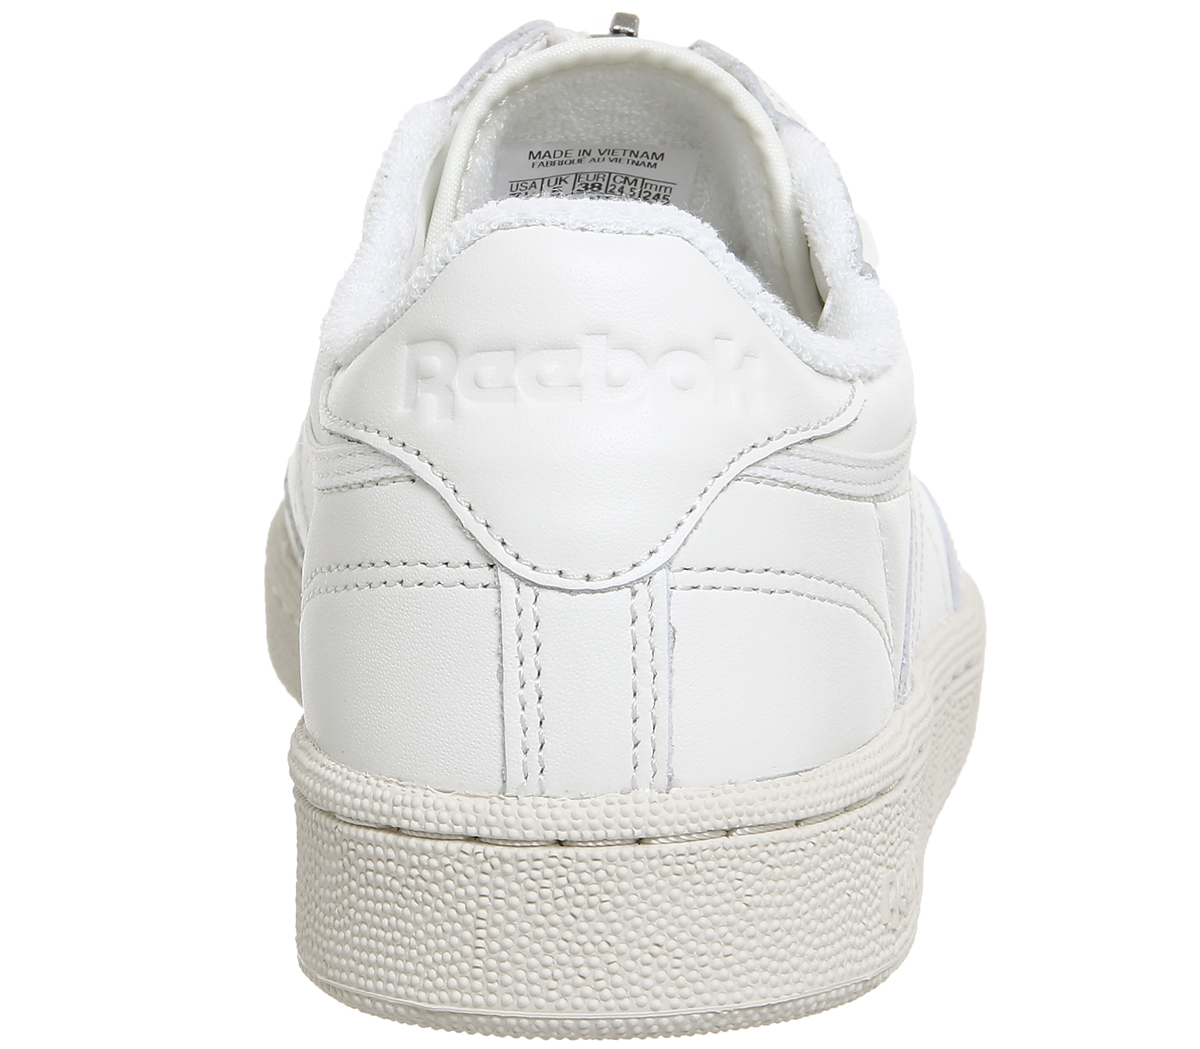 40eca6fce49 Womens Reebok Club C 85 Zip Chalk Sandstone Trainers Shoes